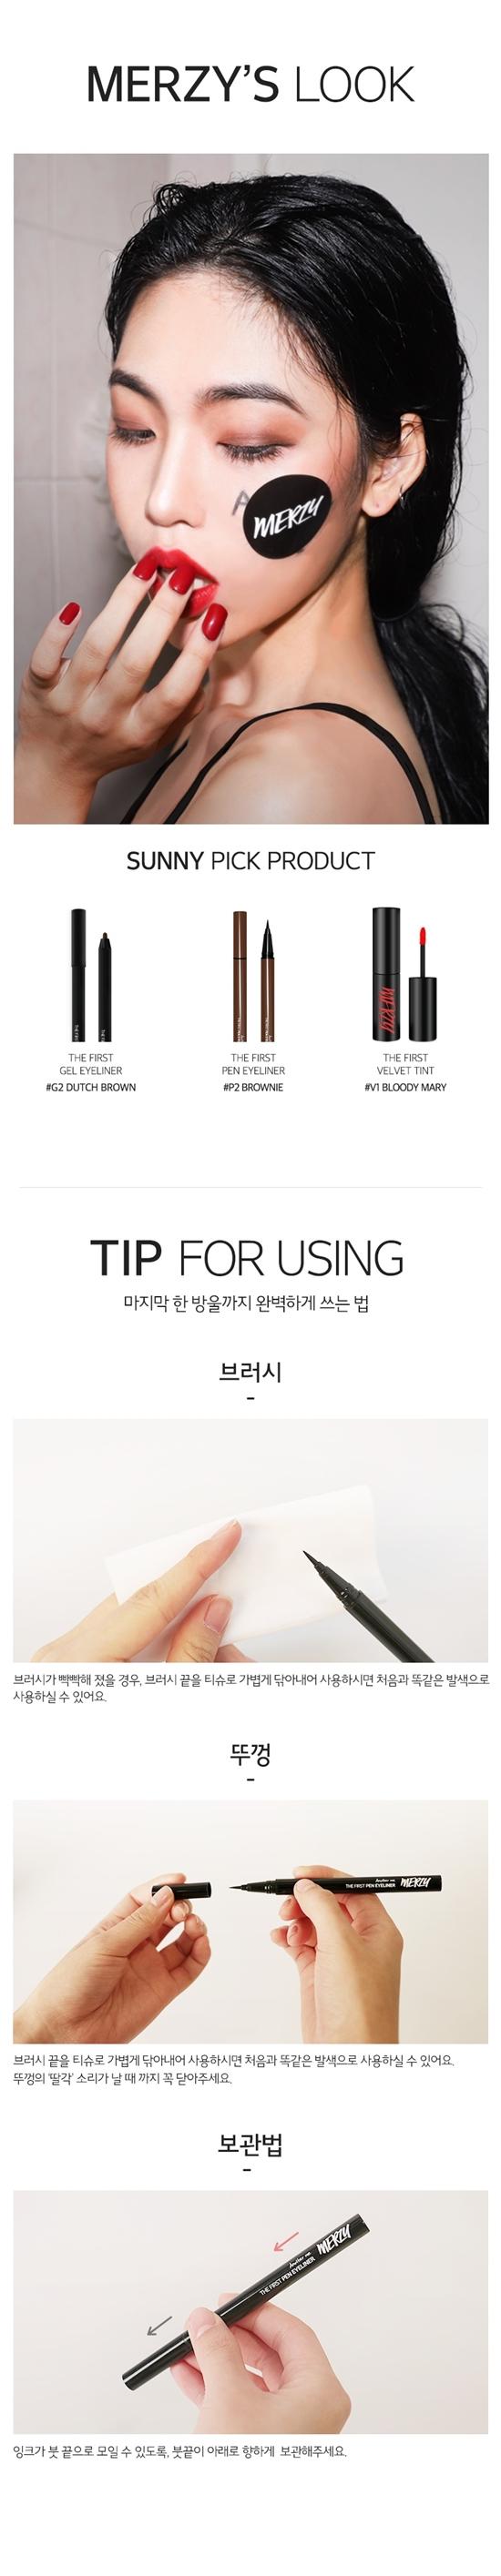 merzy-the-first-pen-eyeliner-info4.jpg